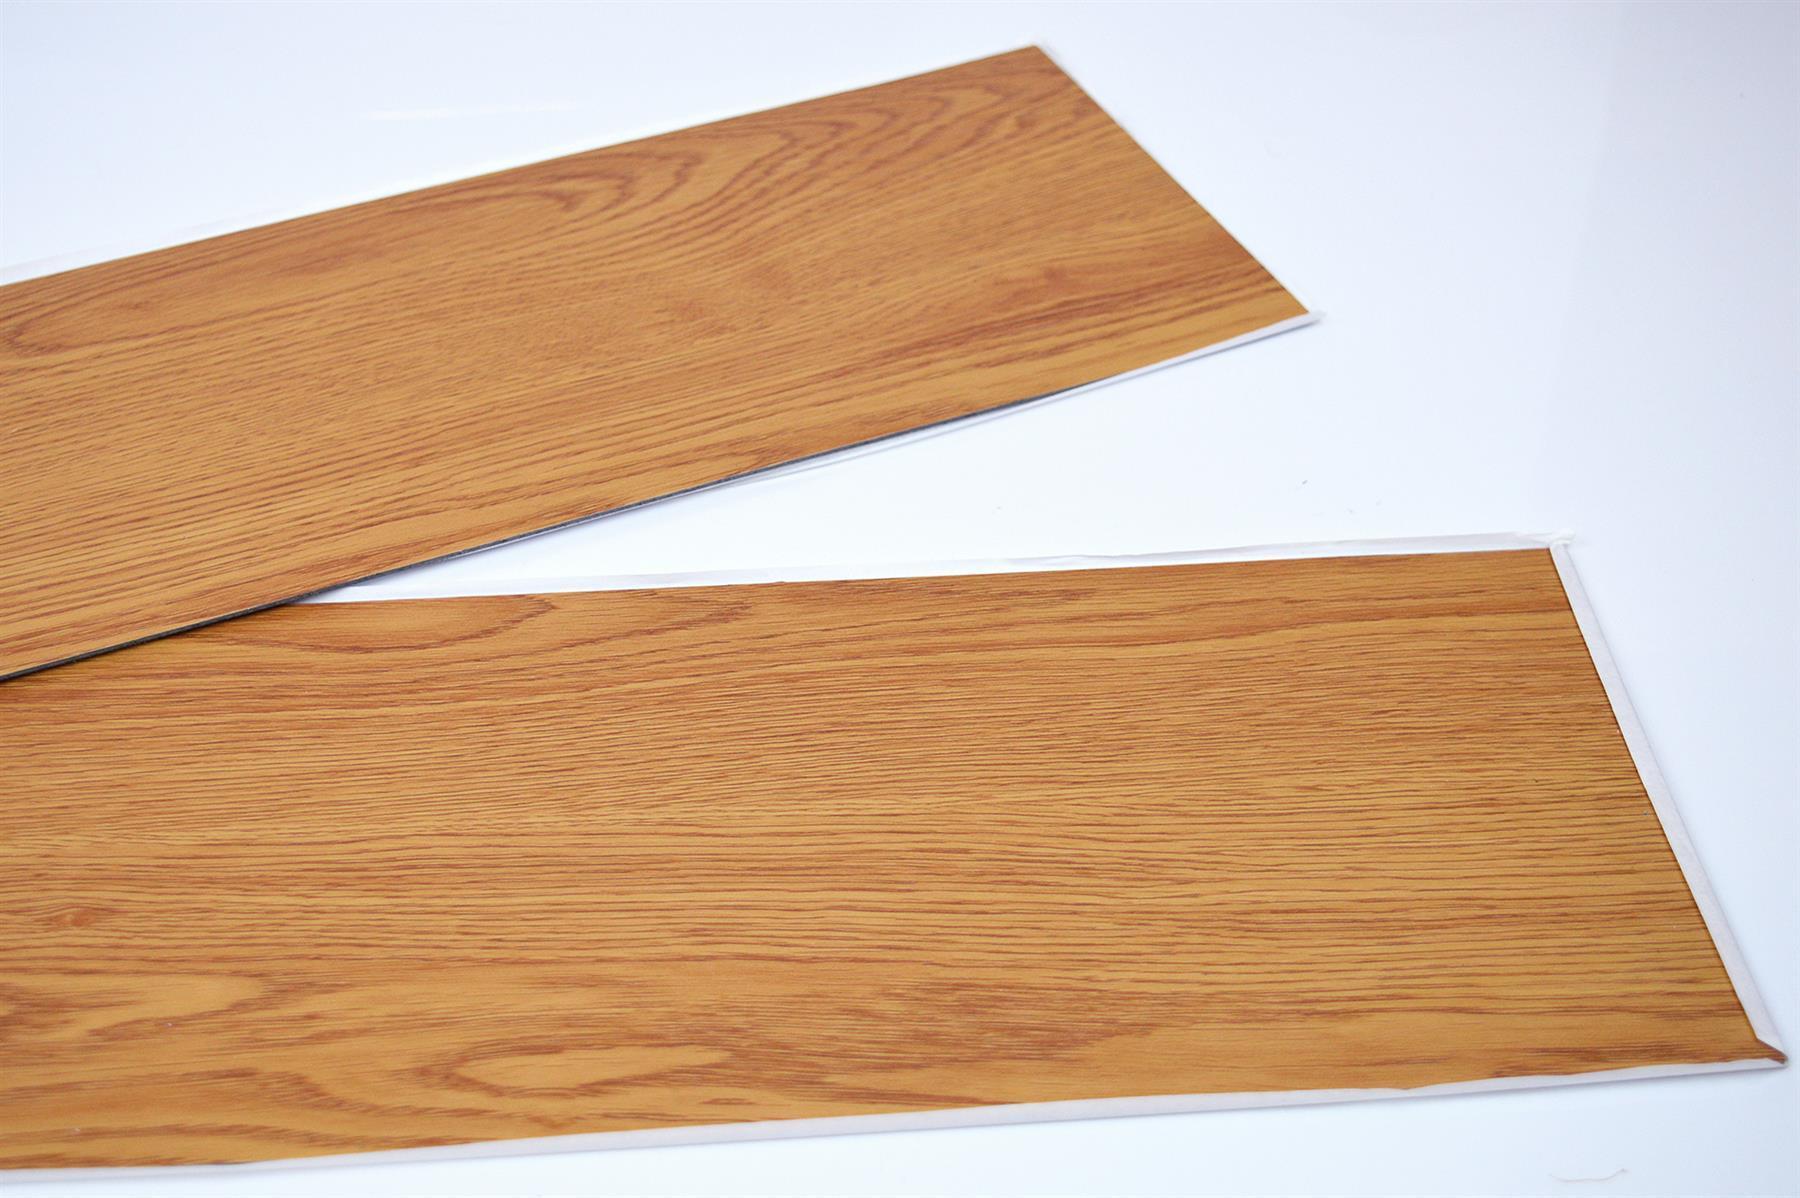 thumbnail 23 - Floor Planks Tiles Self Adhesive Vinyl Brown Wood Flooring Kitchen Bathroom